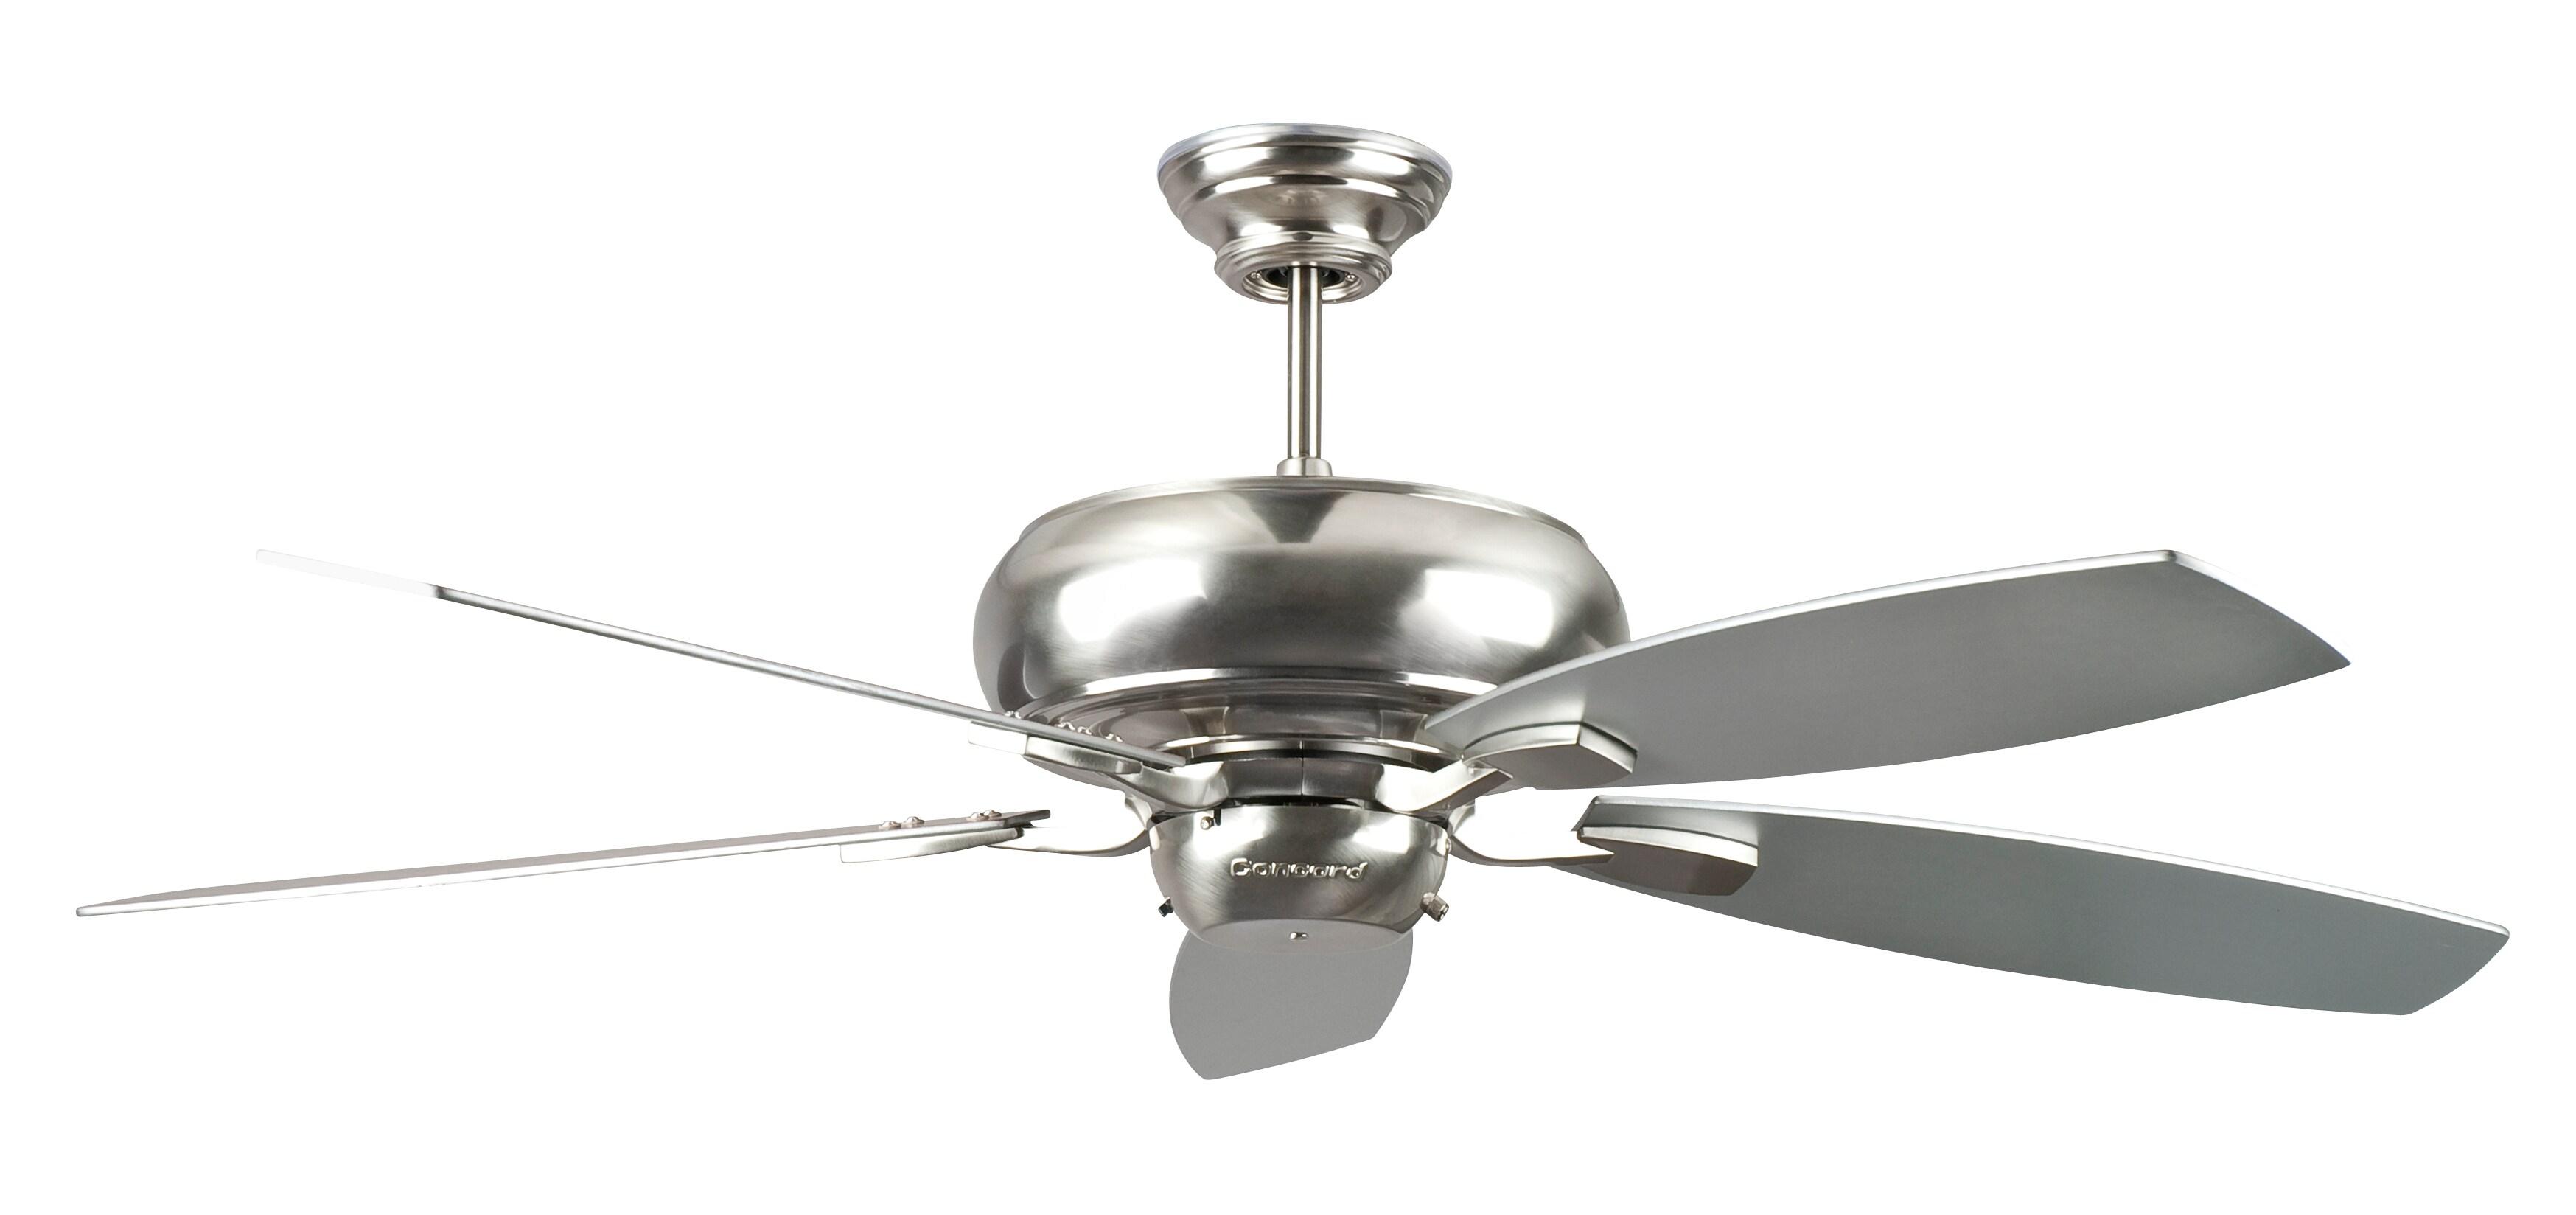 52 Inch Stainless Steel Five Blade Ceiling Fan Free